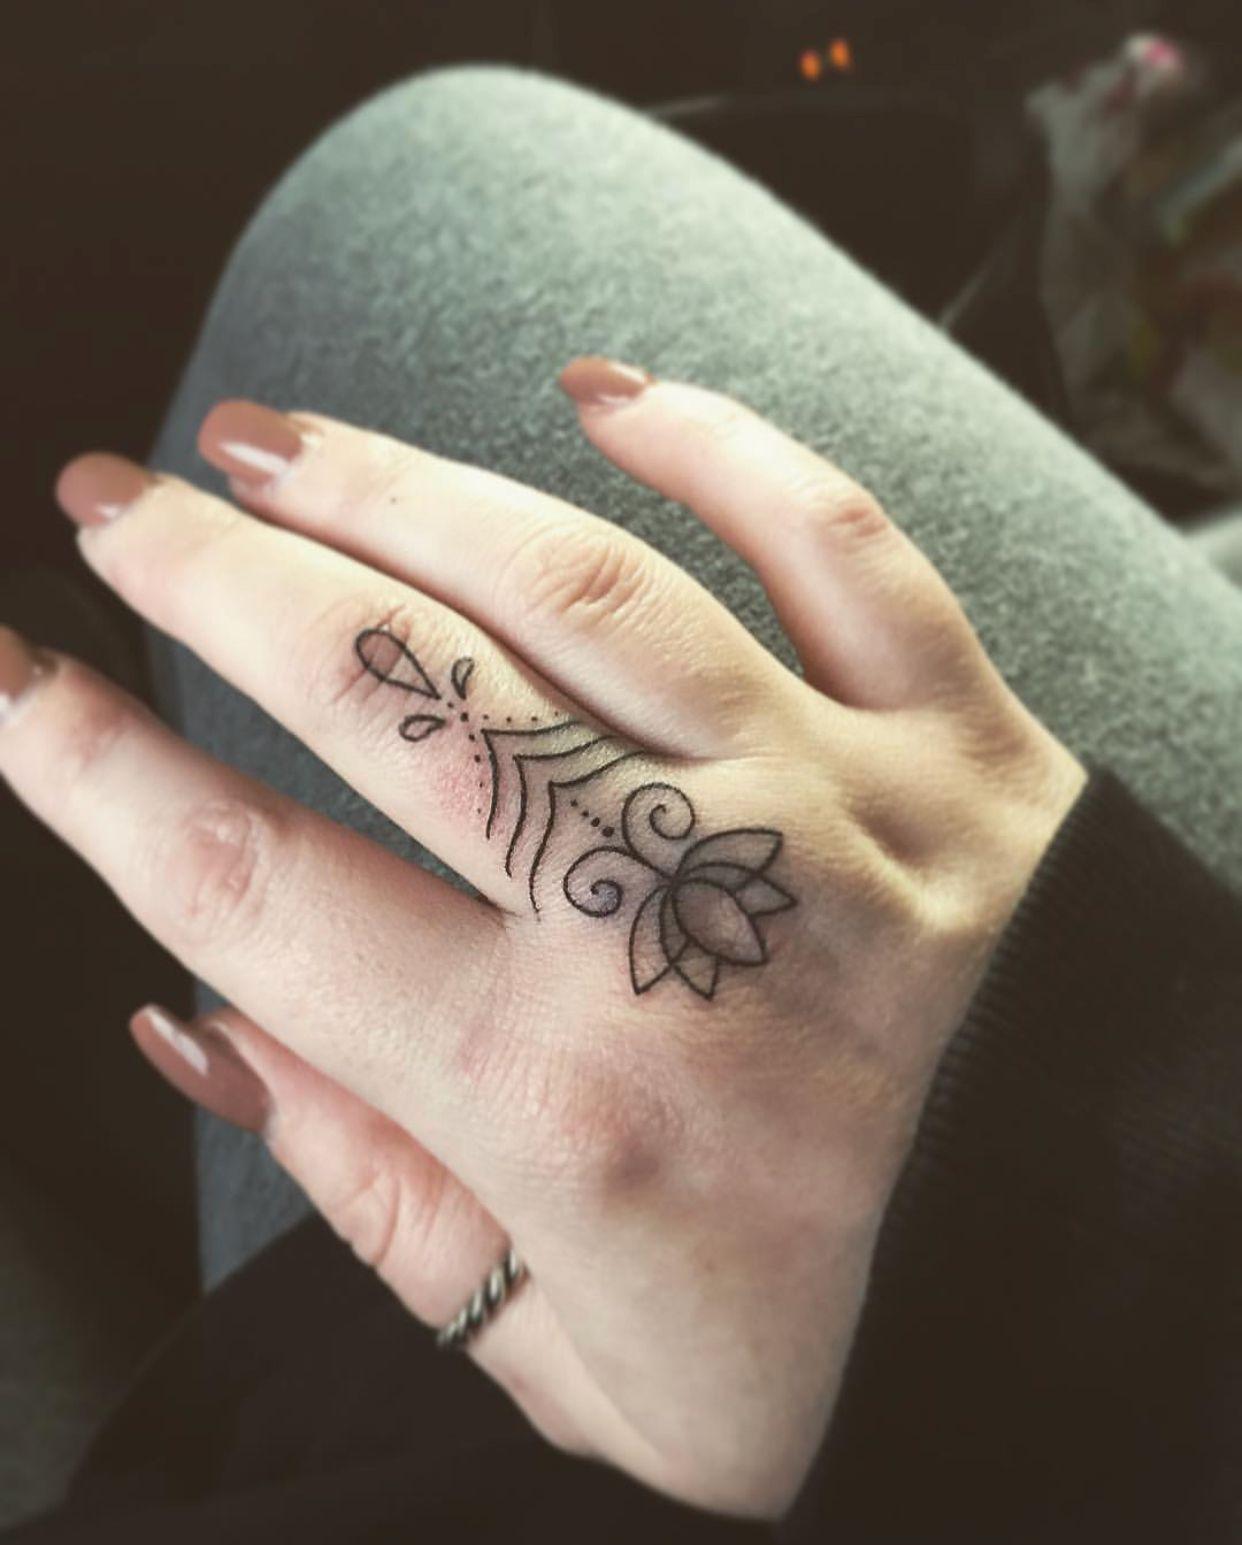 #finger #tattoo #henna #pretty #pattern #tattoosforwomen #girlswithtattoos #pandora #ring